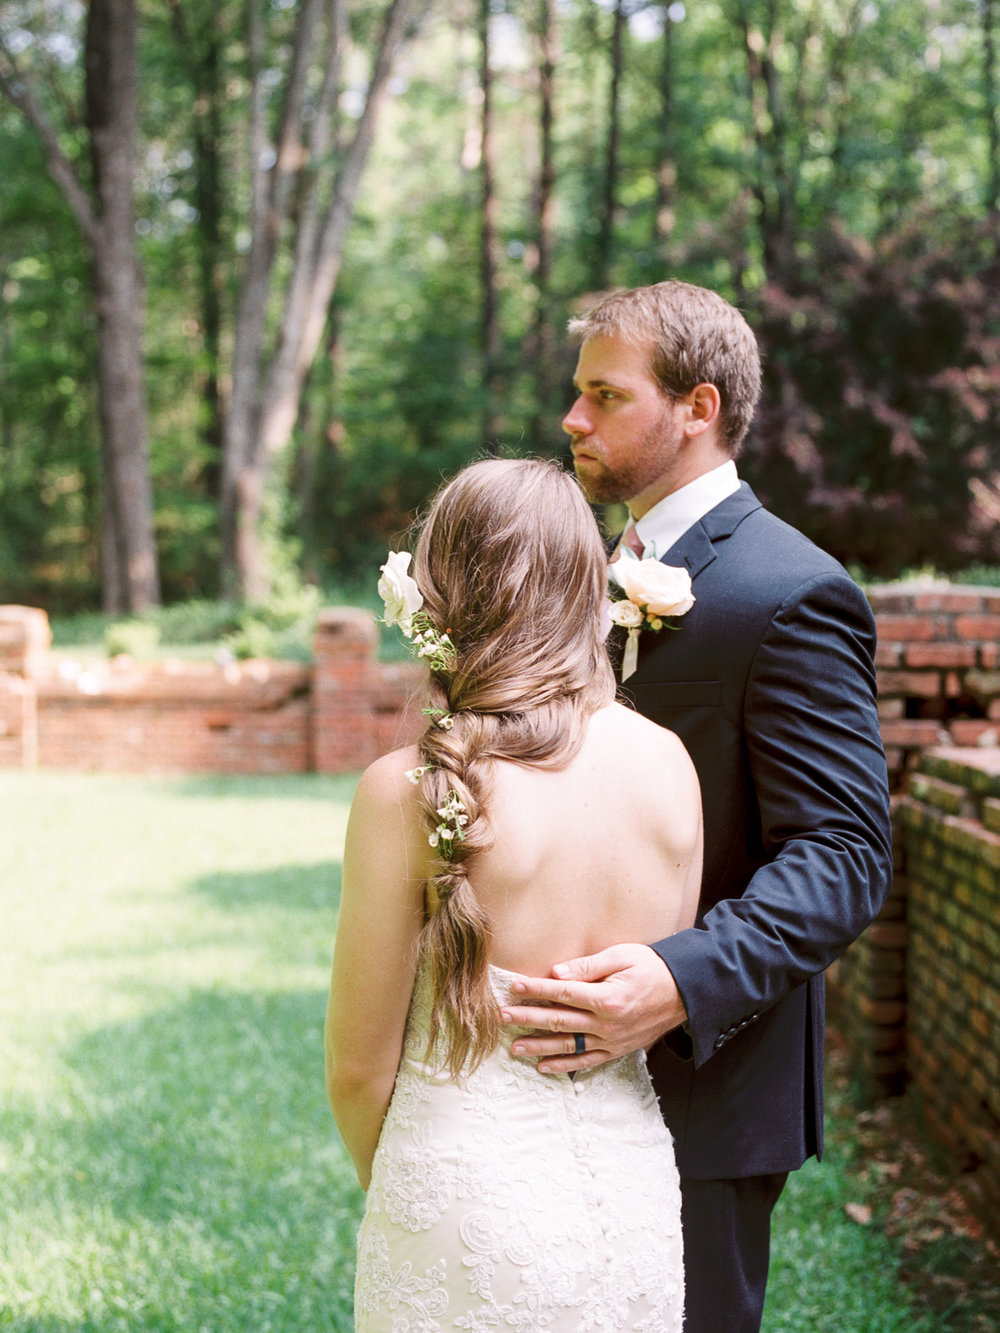 christinadavisphotography-romanticwedding-gardenweddinginspiration07.jpg